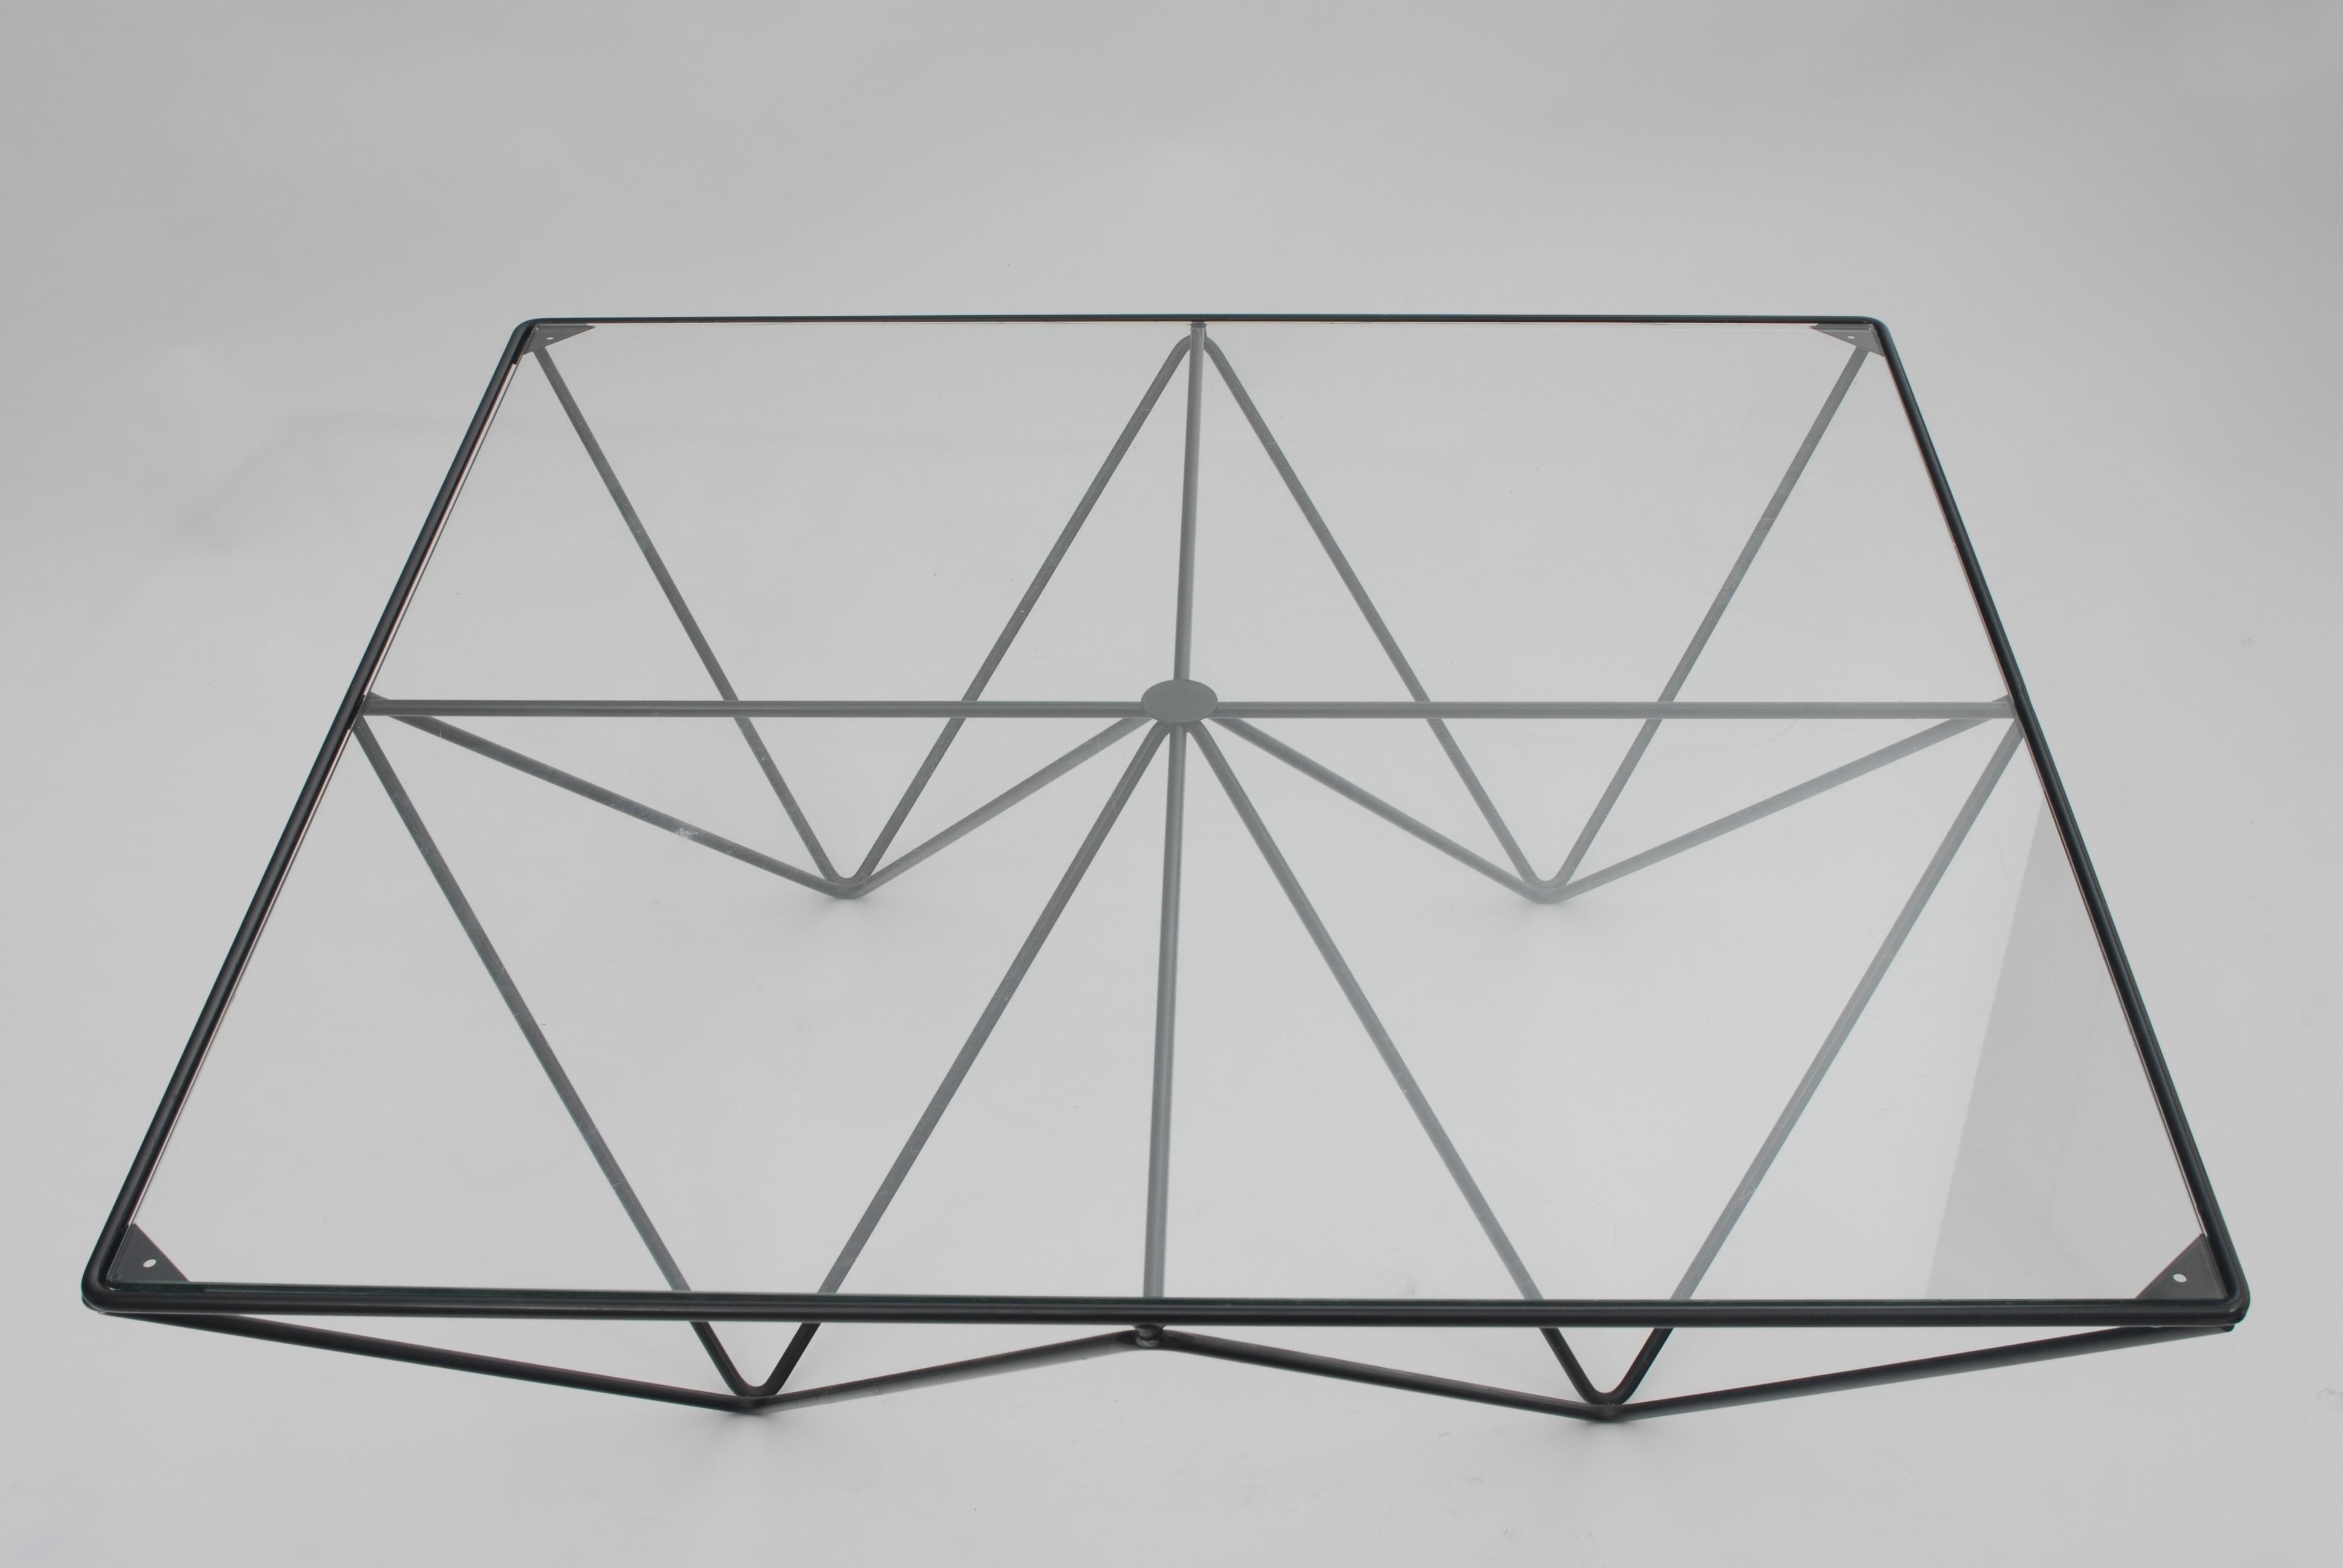 "Alanda"" Italian coffee table in metal Paolo PIVA 1980s Design"